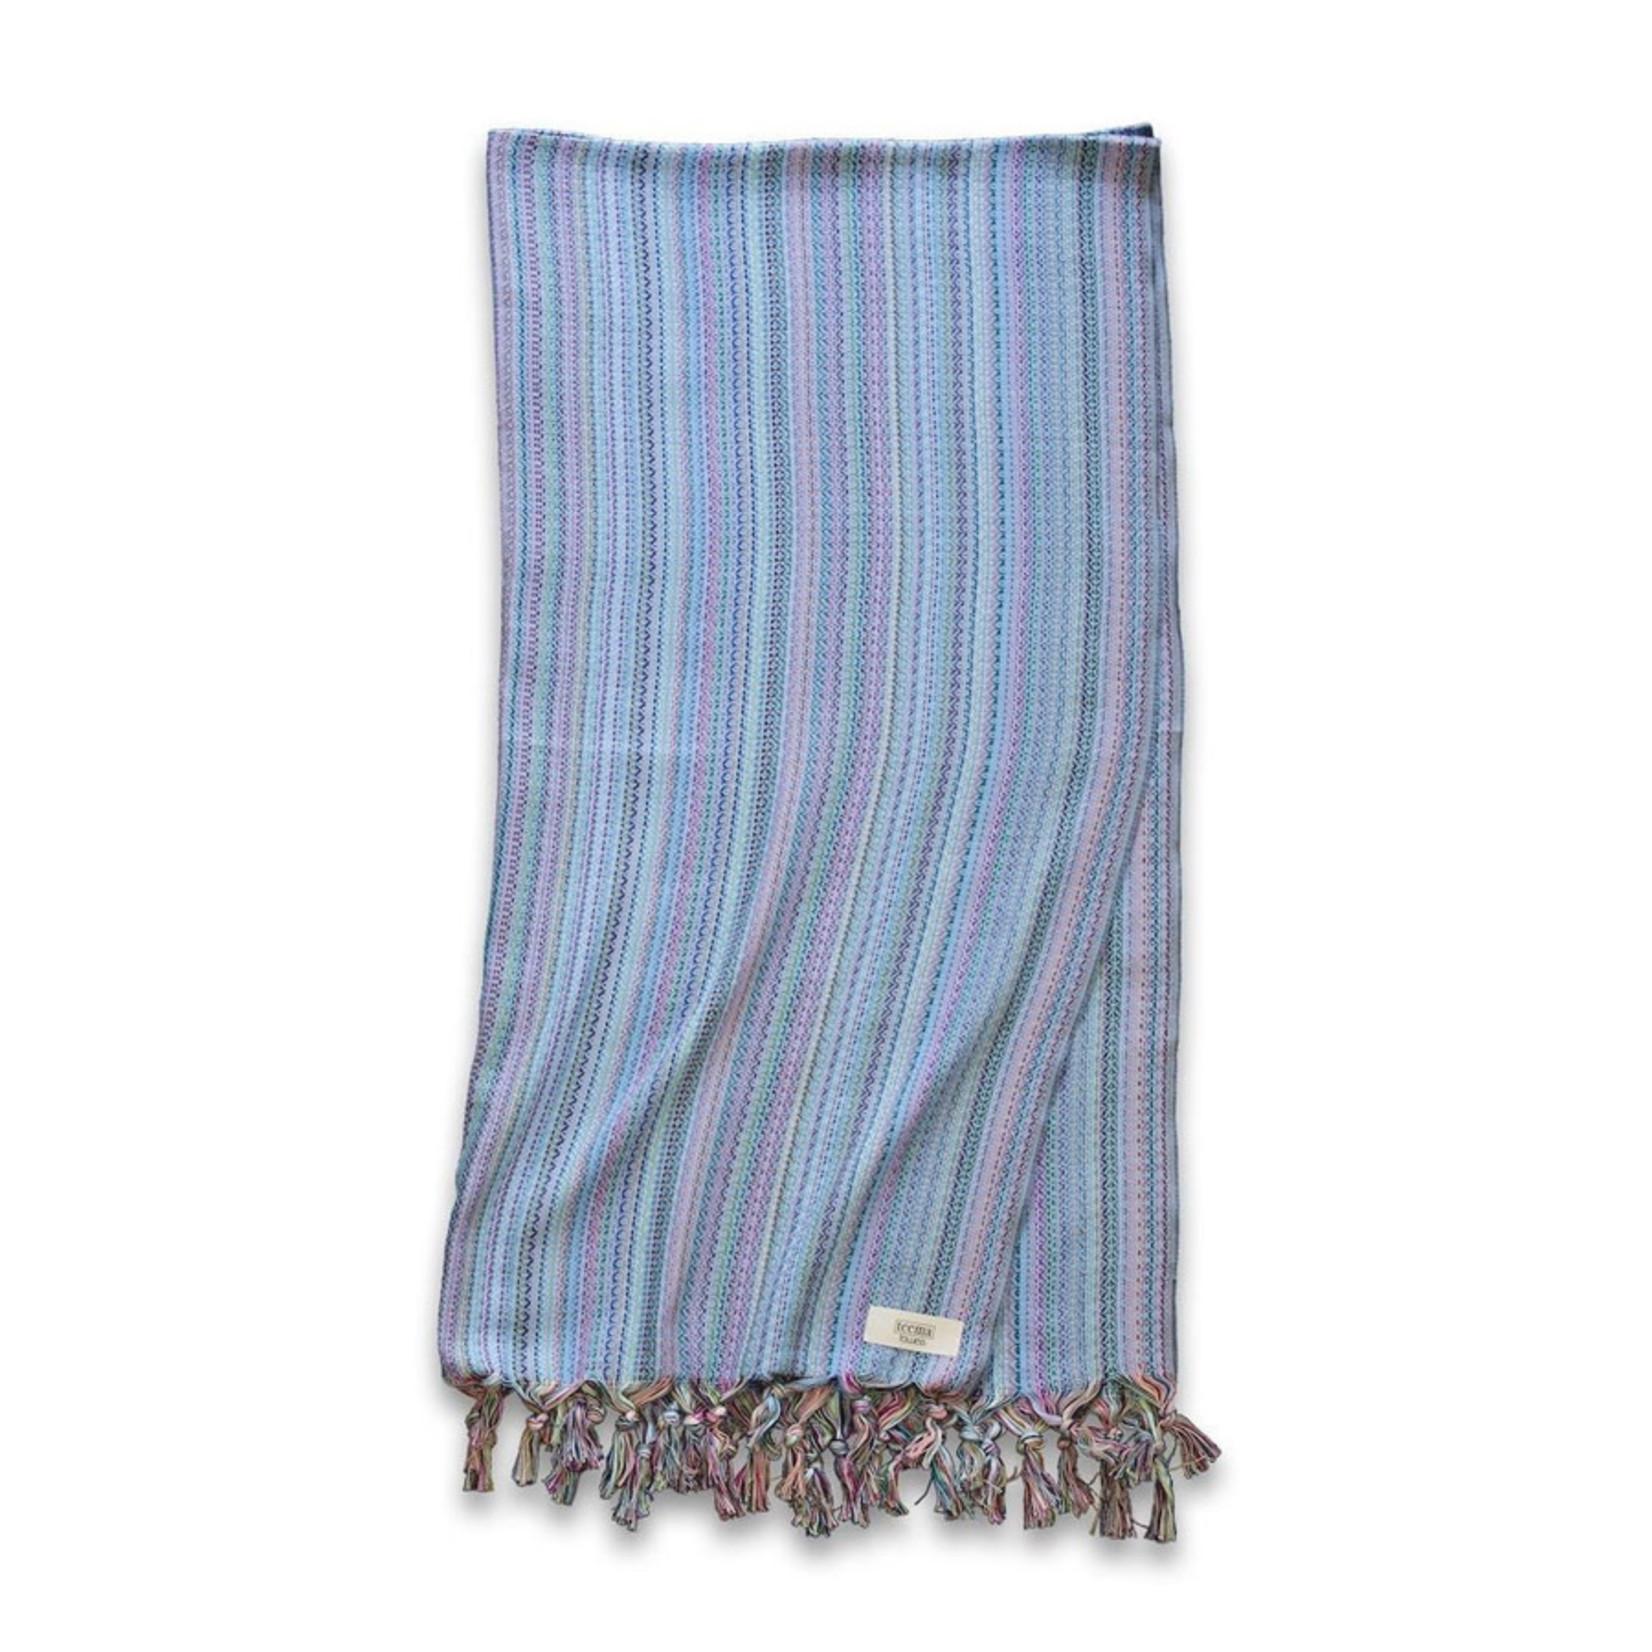 Teema The Labyrinth Towel